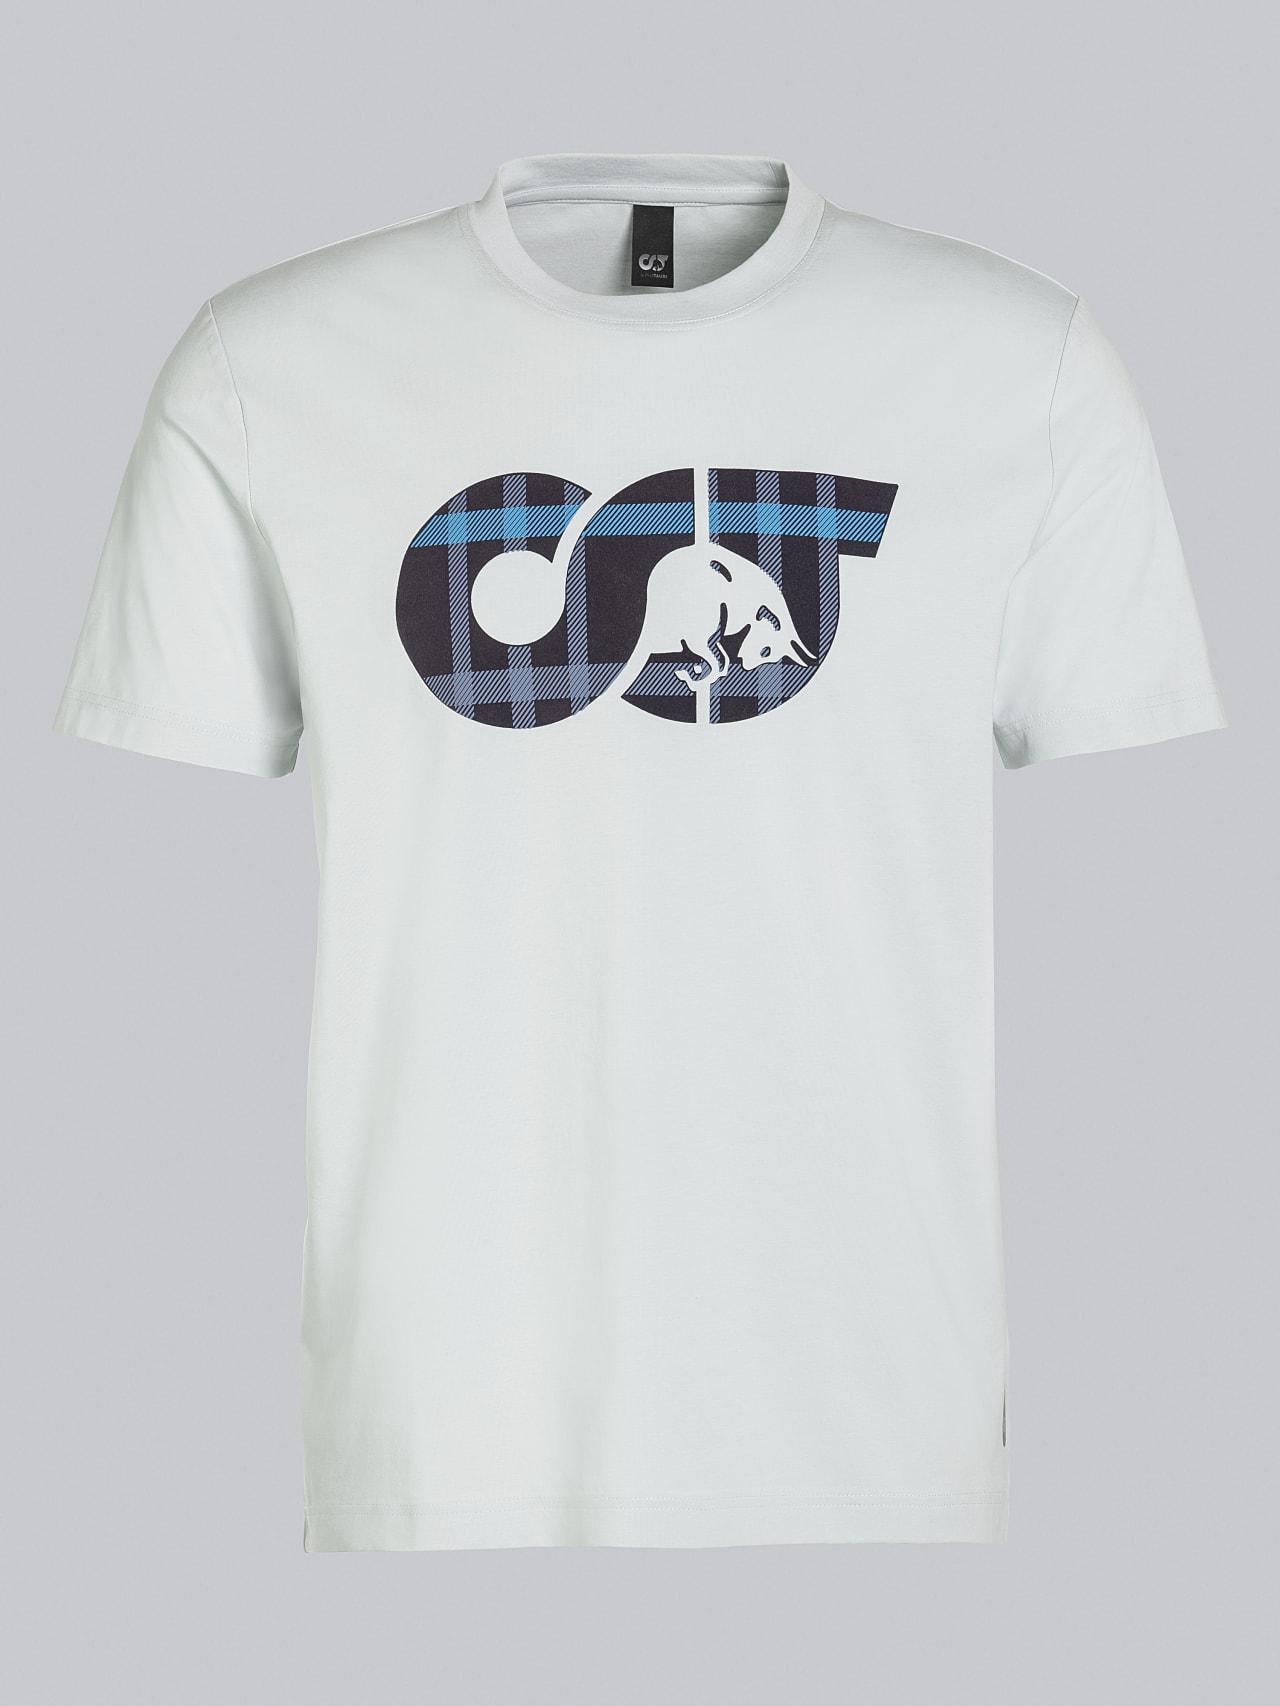 JABIS V1.Y5.02 Logo Print T-Shirt Pale Blue  Back Alpha Tauri